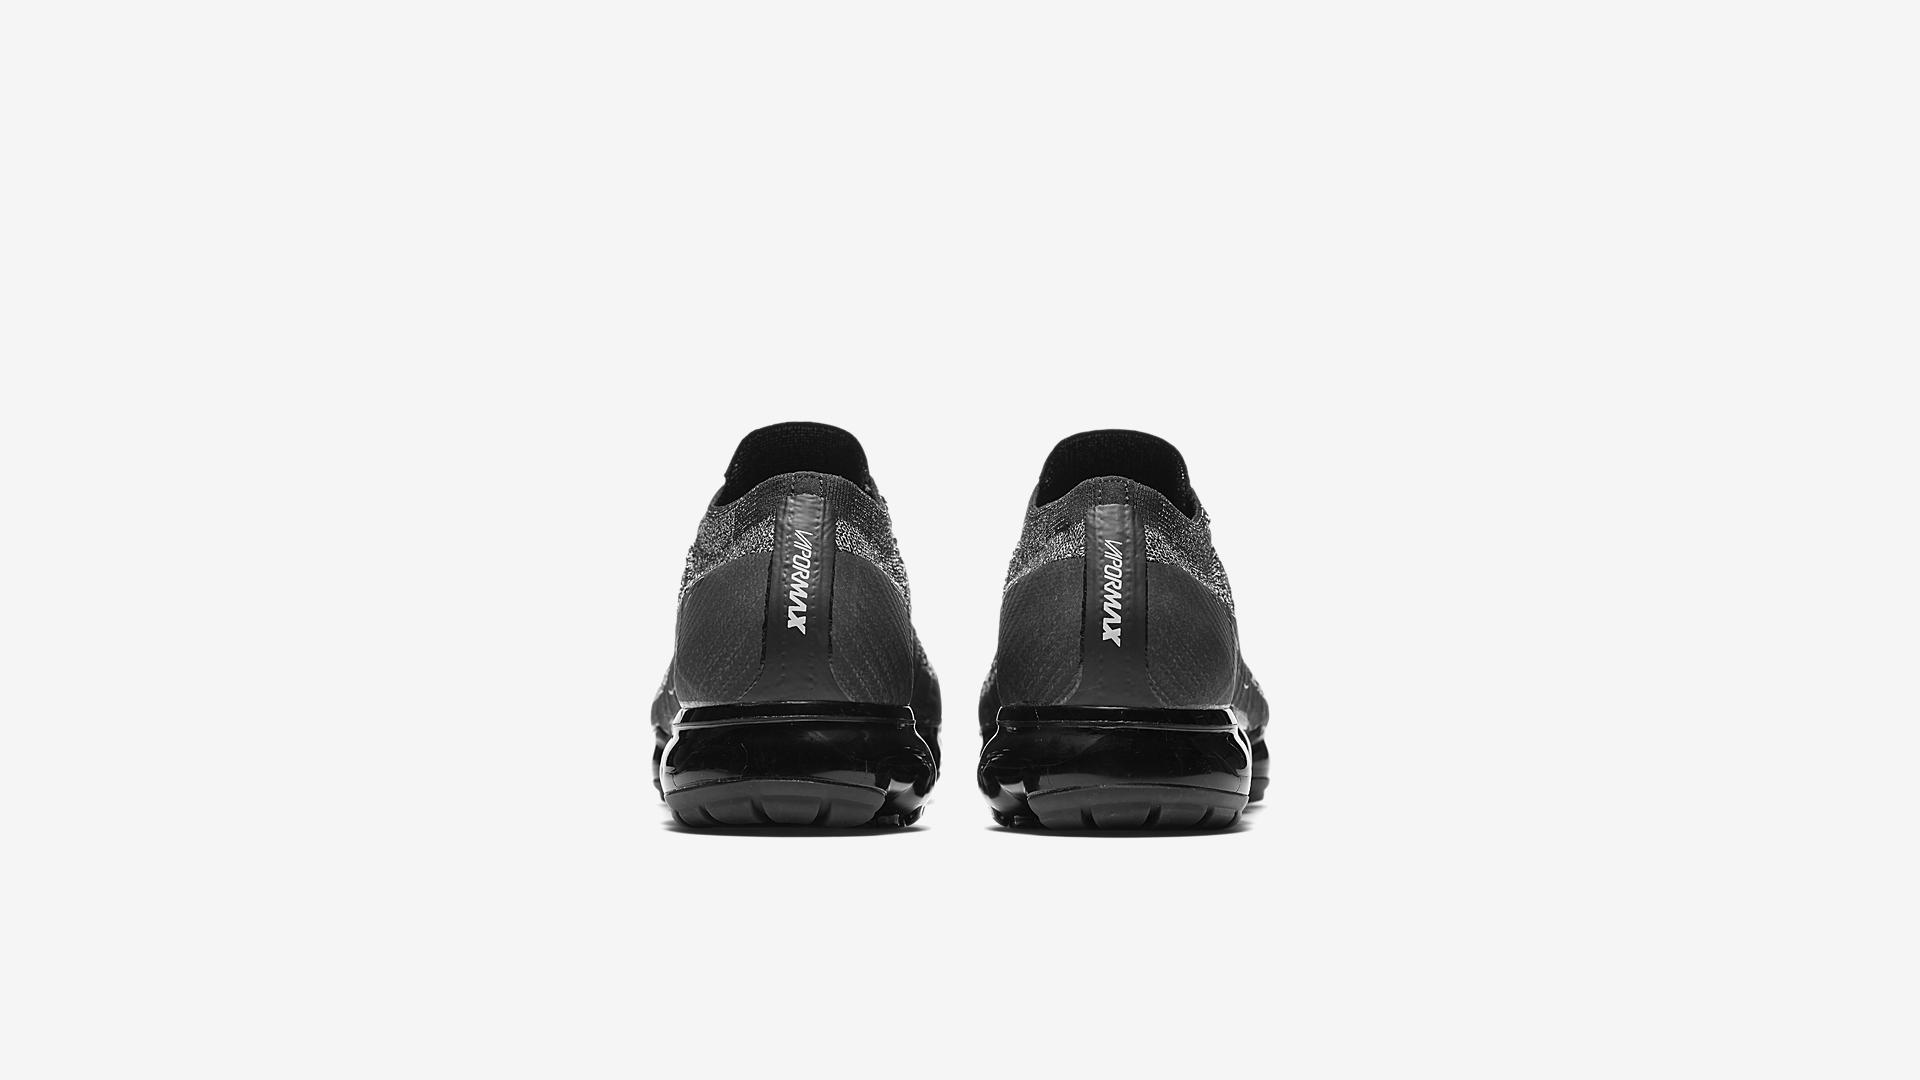 849558 041 Nike Air VaporMax Oreo 2